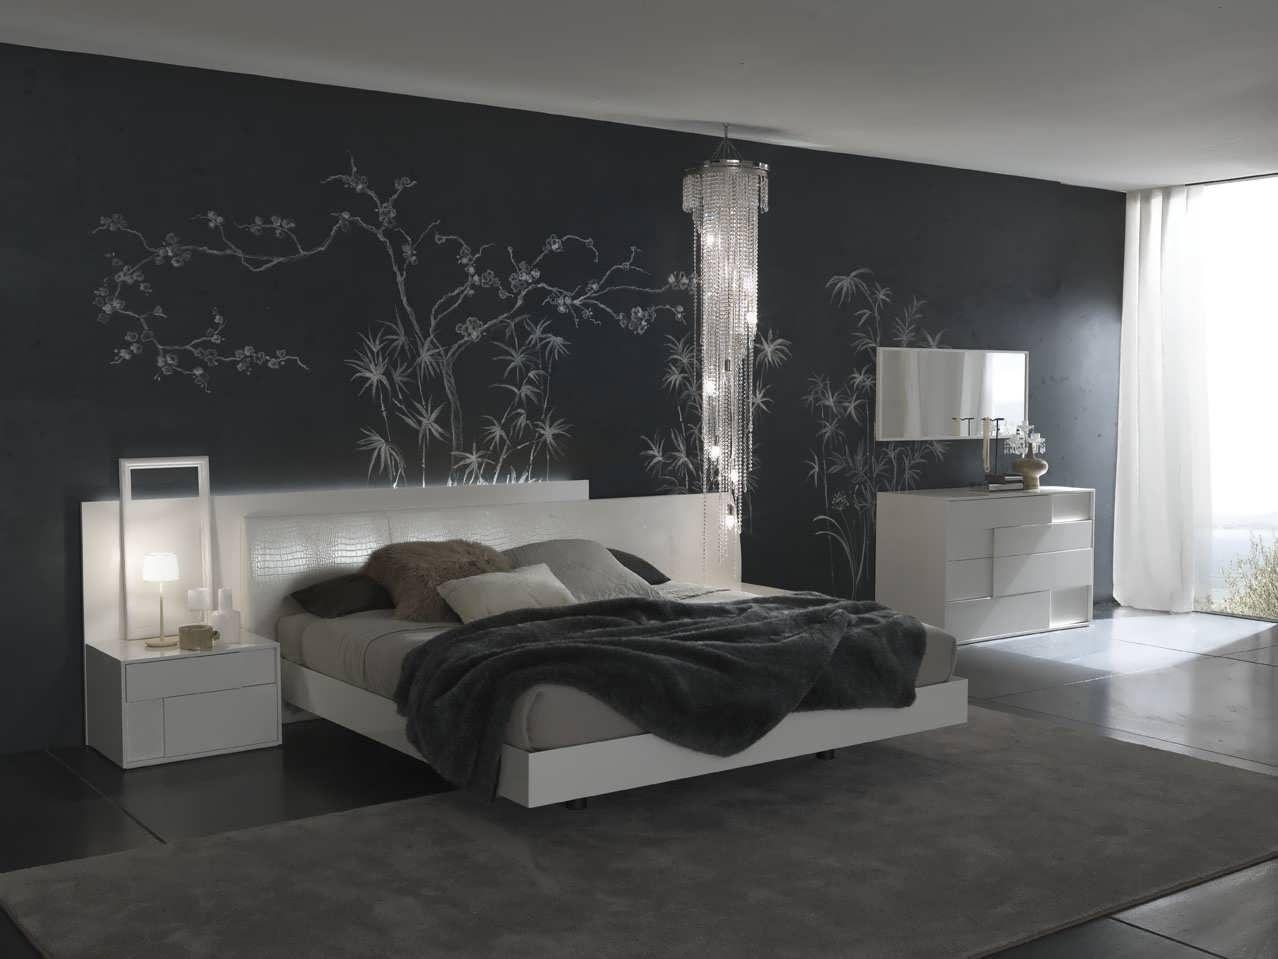 Bedroom Themes Tumblr Better Than Room Versus White Wallpaper Stiker Dinding Lux 5 23pr